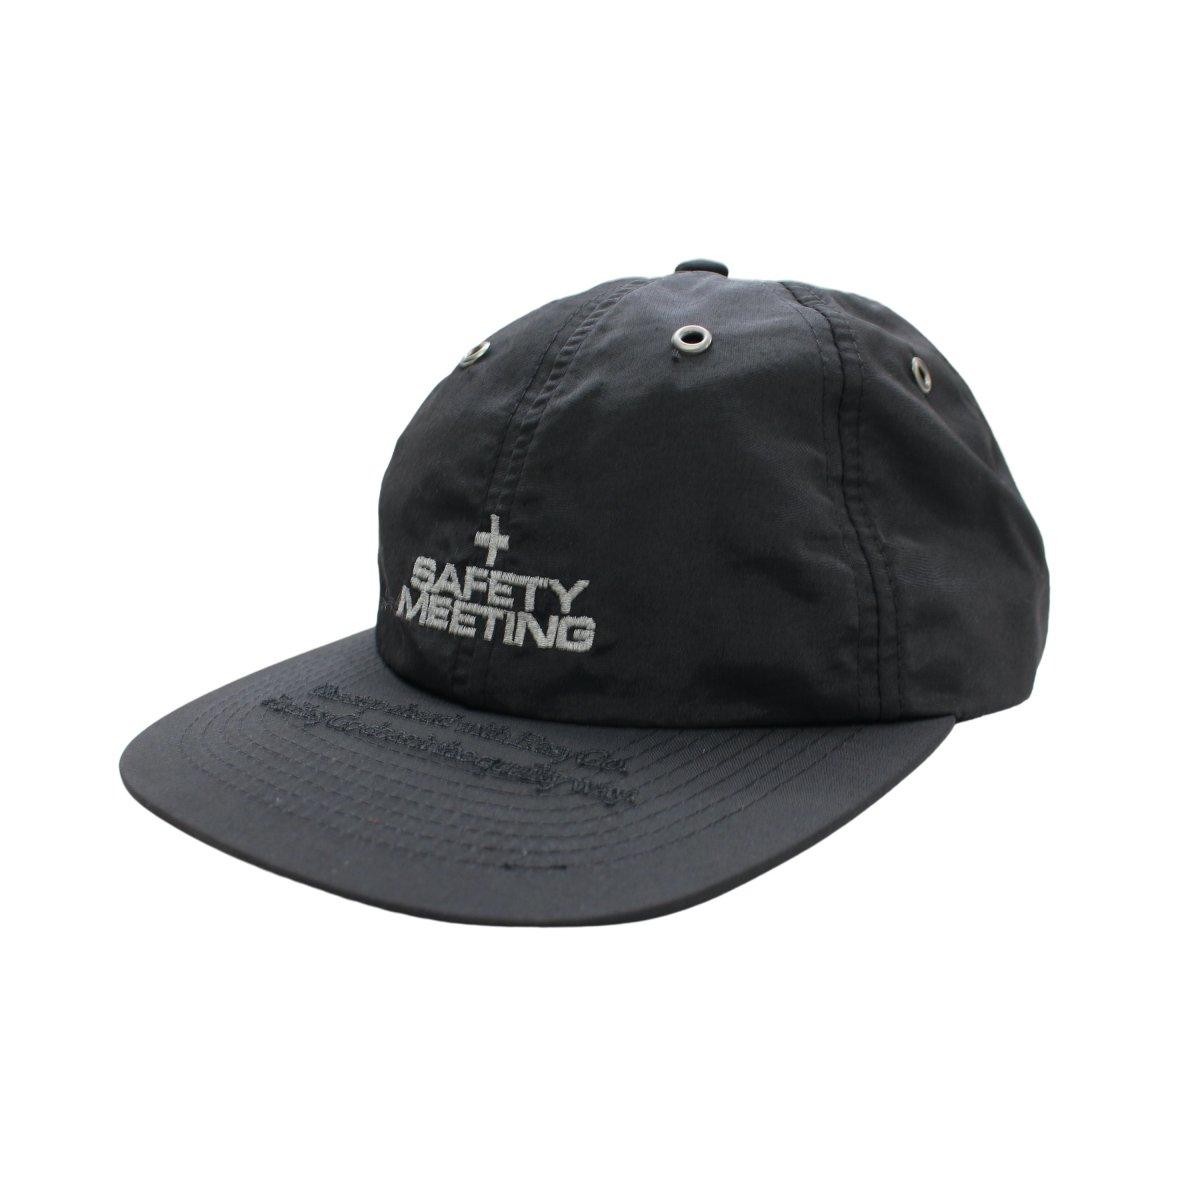 Black 4 panel hat